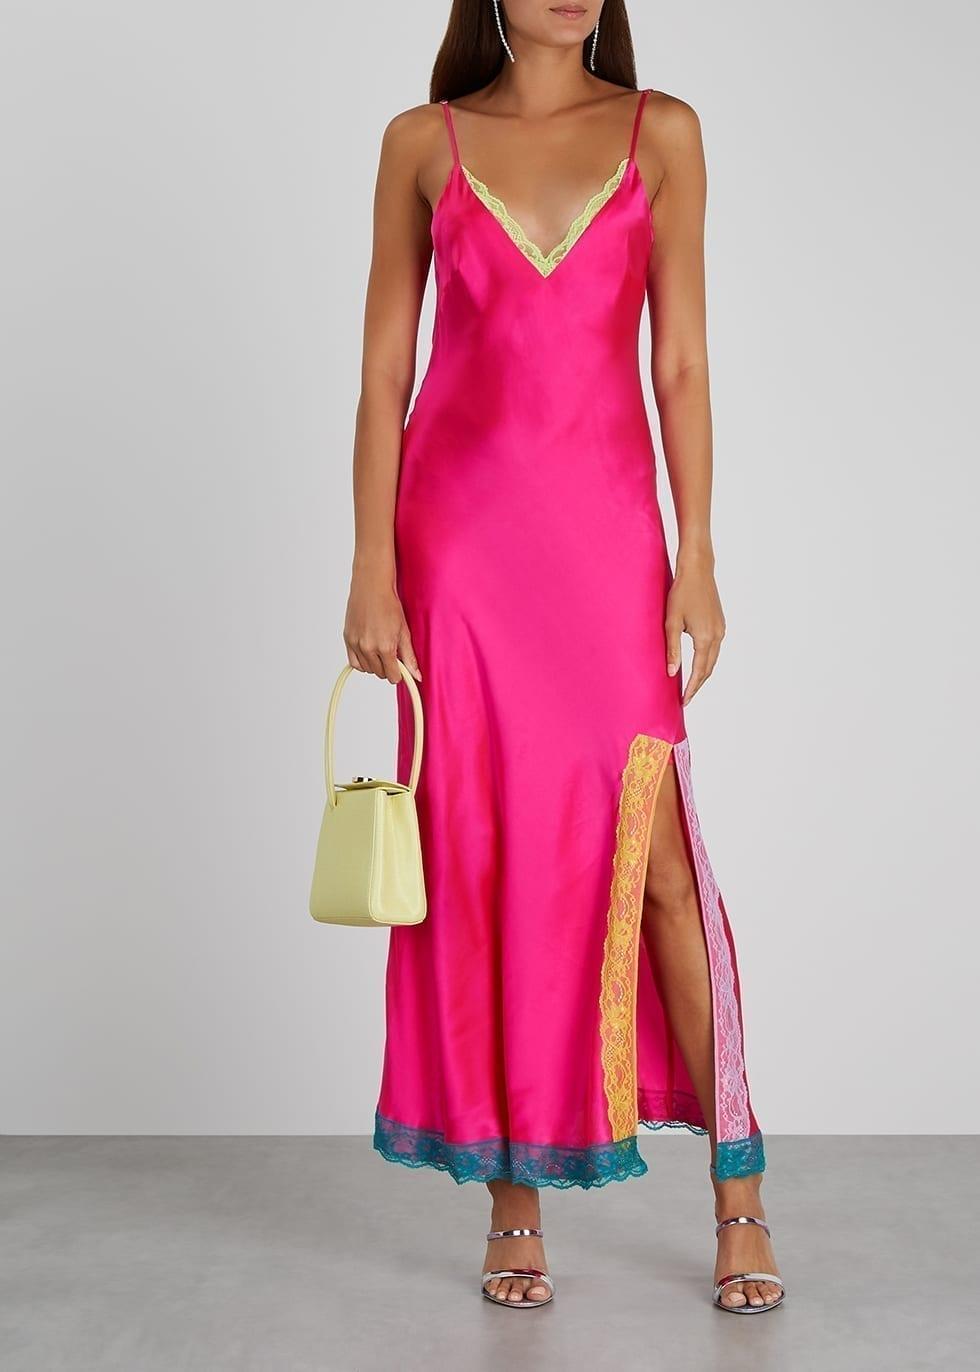 OLIVIA RUBIN Veronica Hot Pink Silk Midi Dress